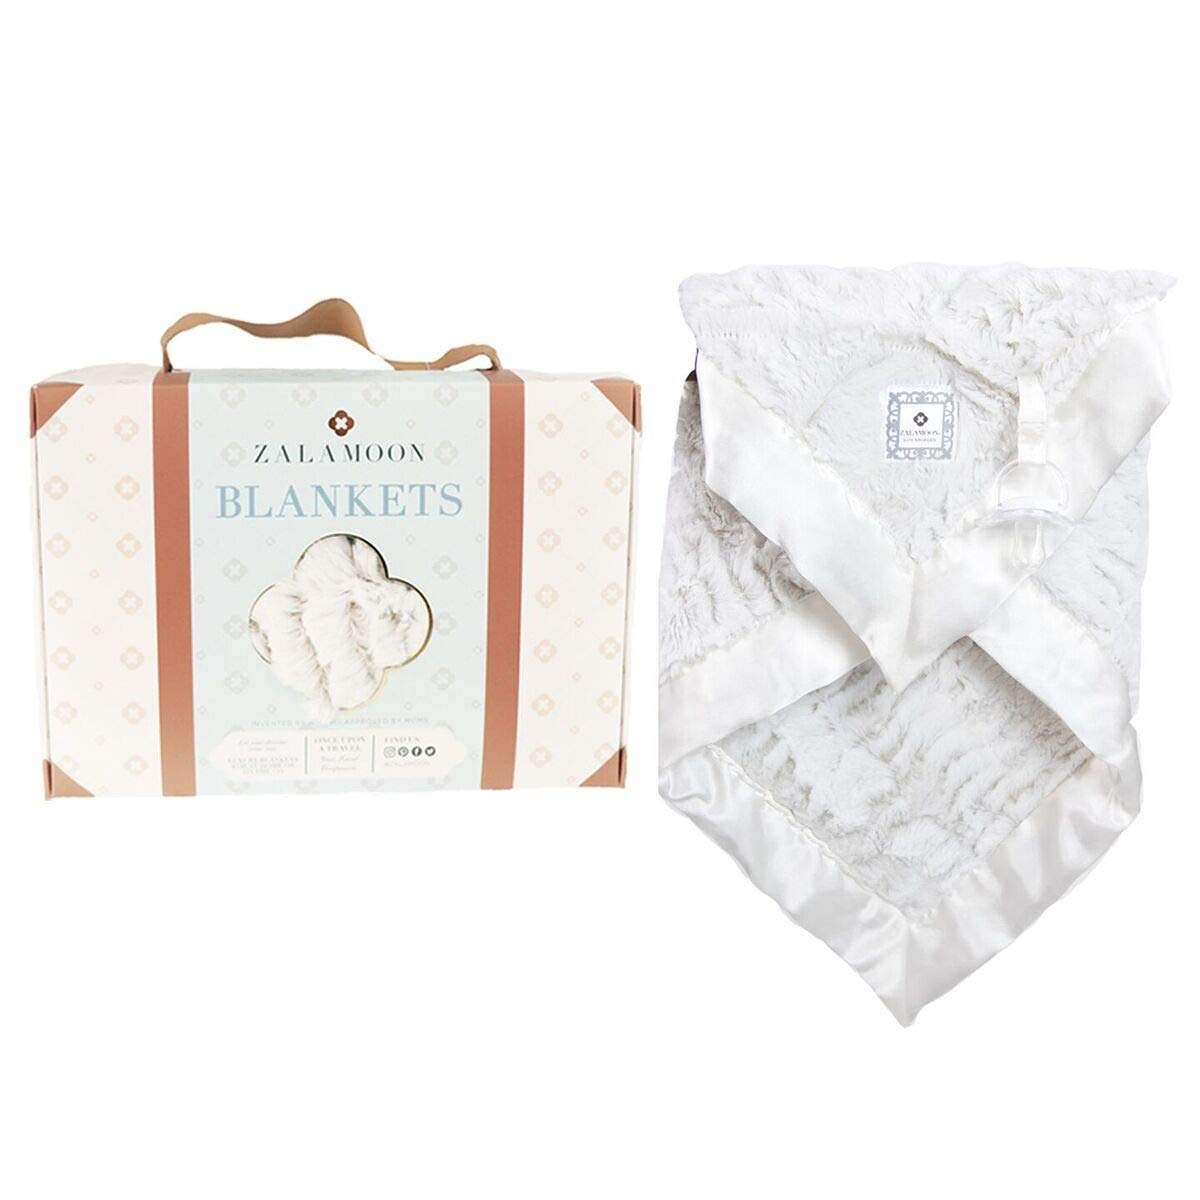 ZALA MOON Zalamoon Luxie Pocket Plush Baby Toddler Blanket with Hook-and-Loop Fastener Strap (Flake)